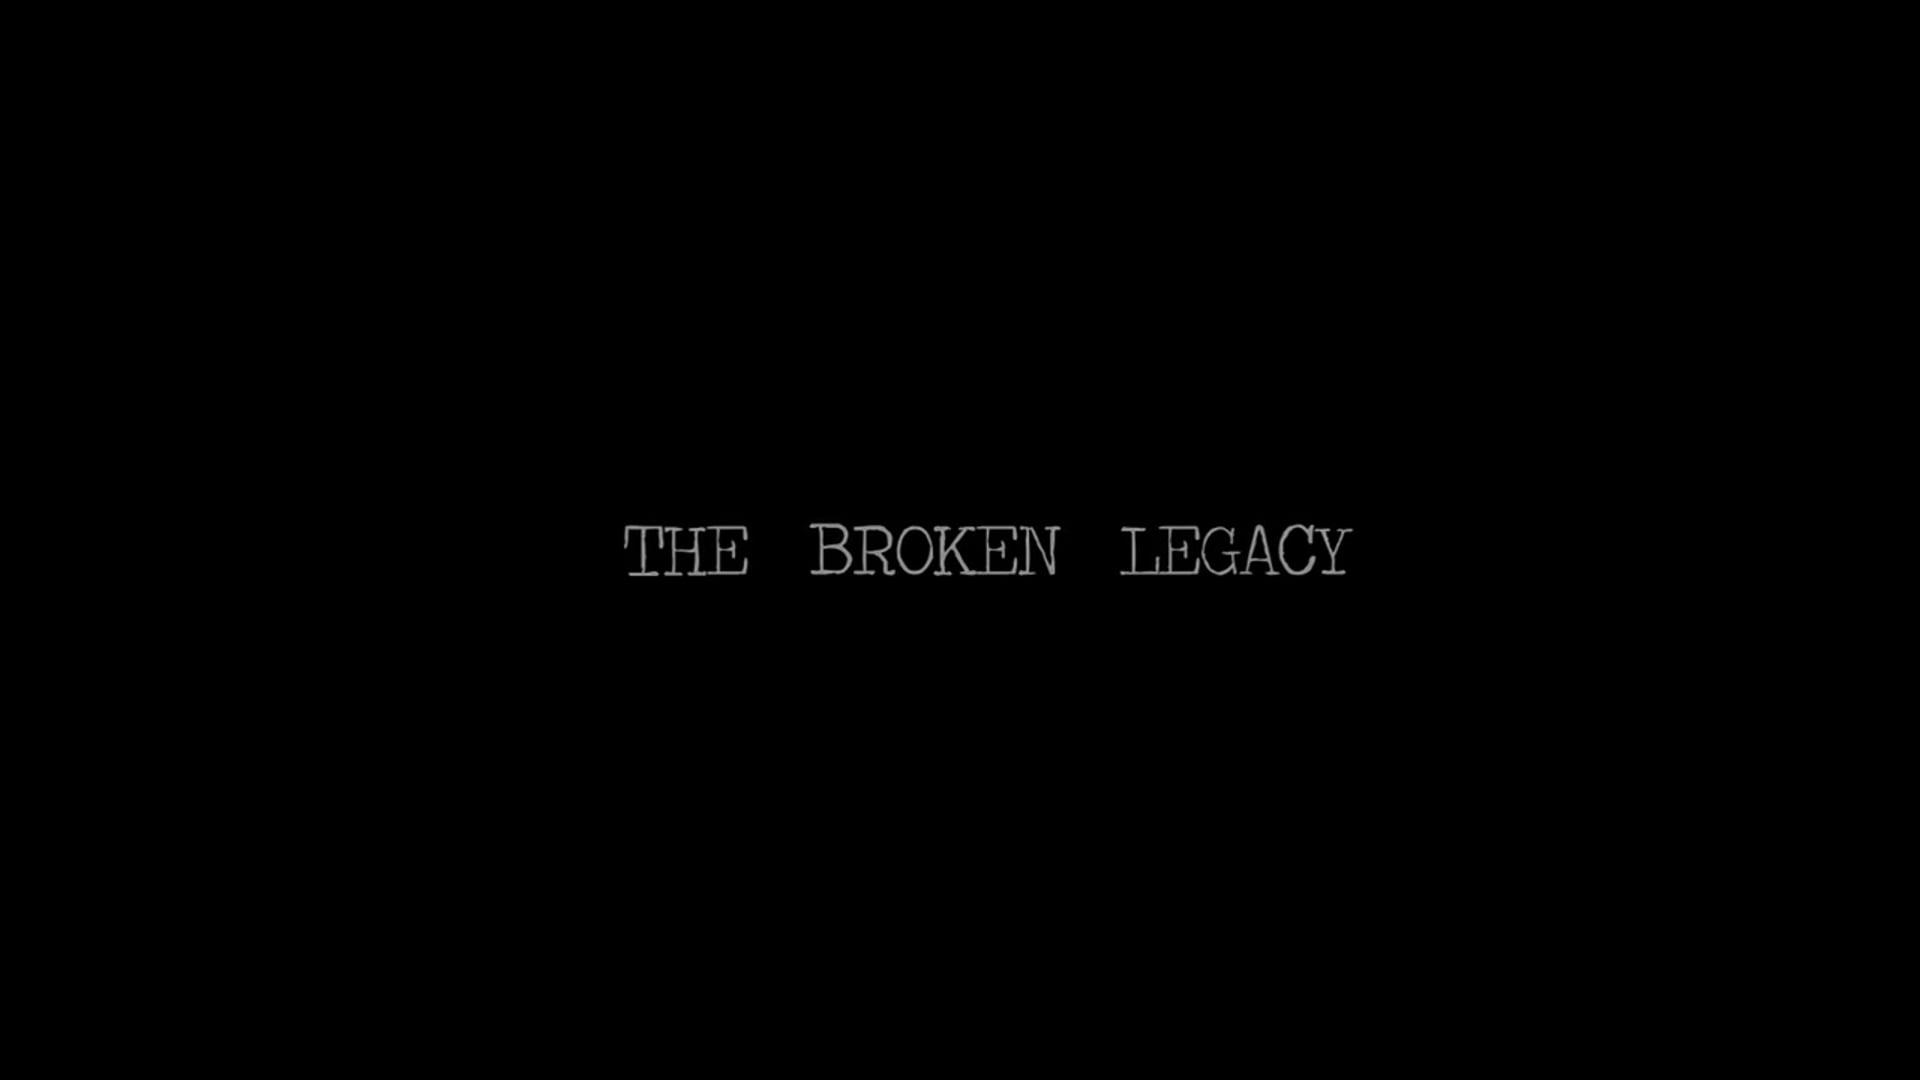 The Broken Legacy Teaser Trailer